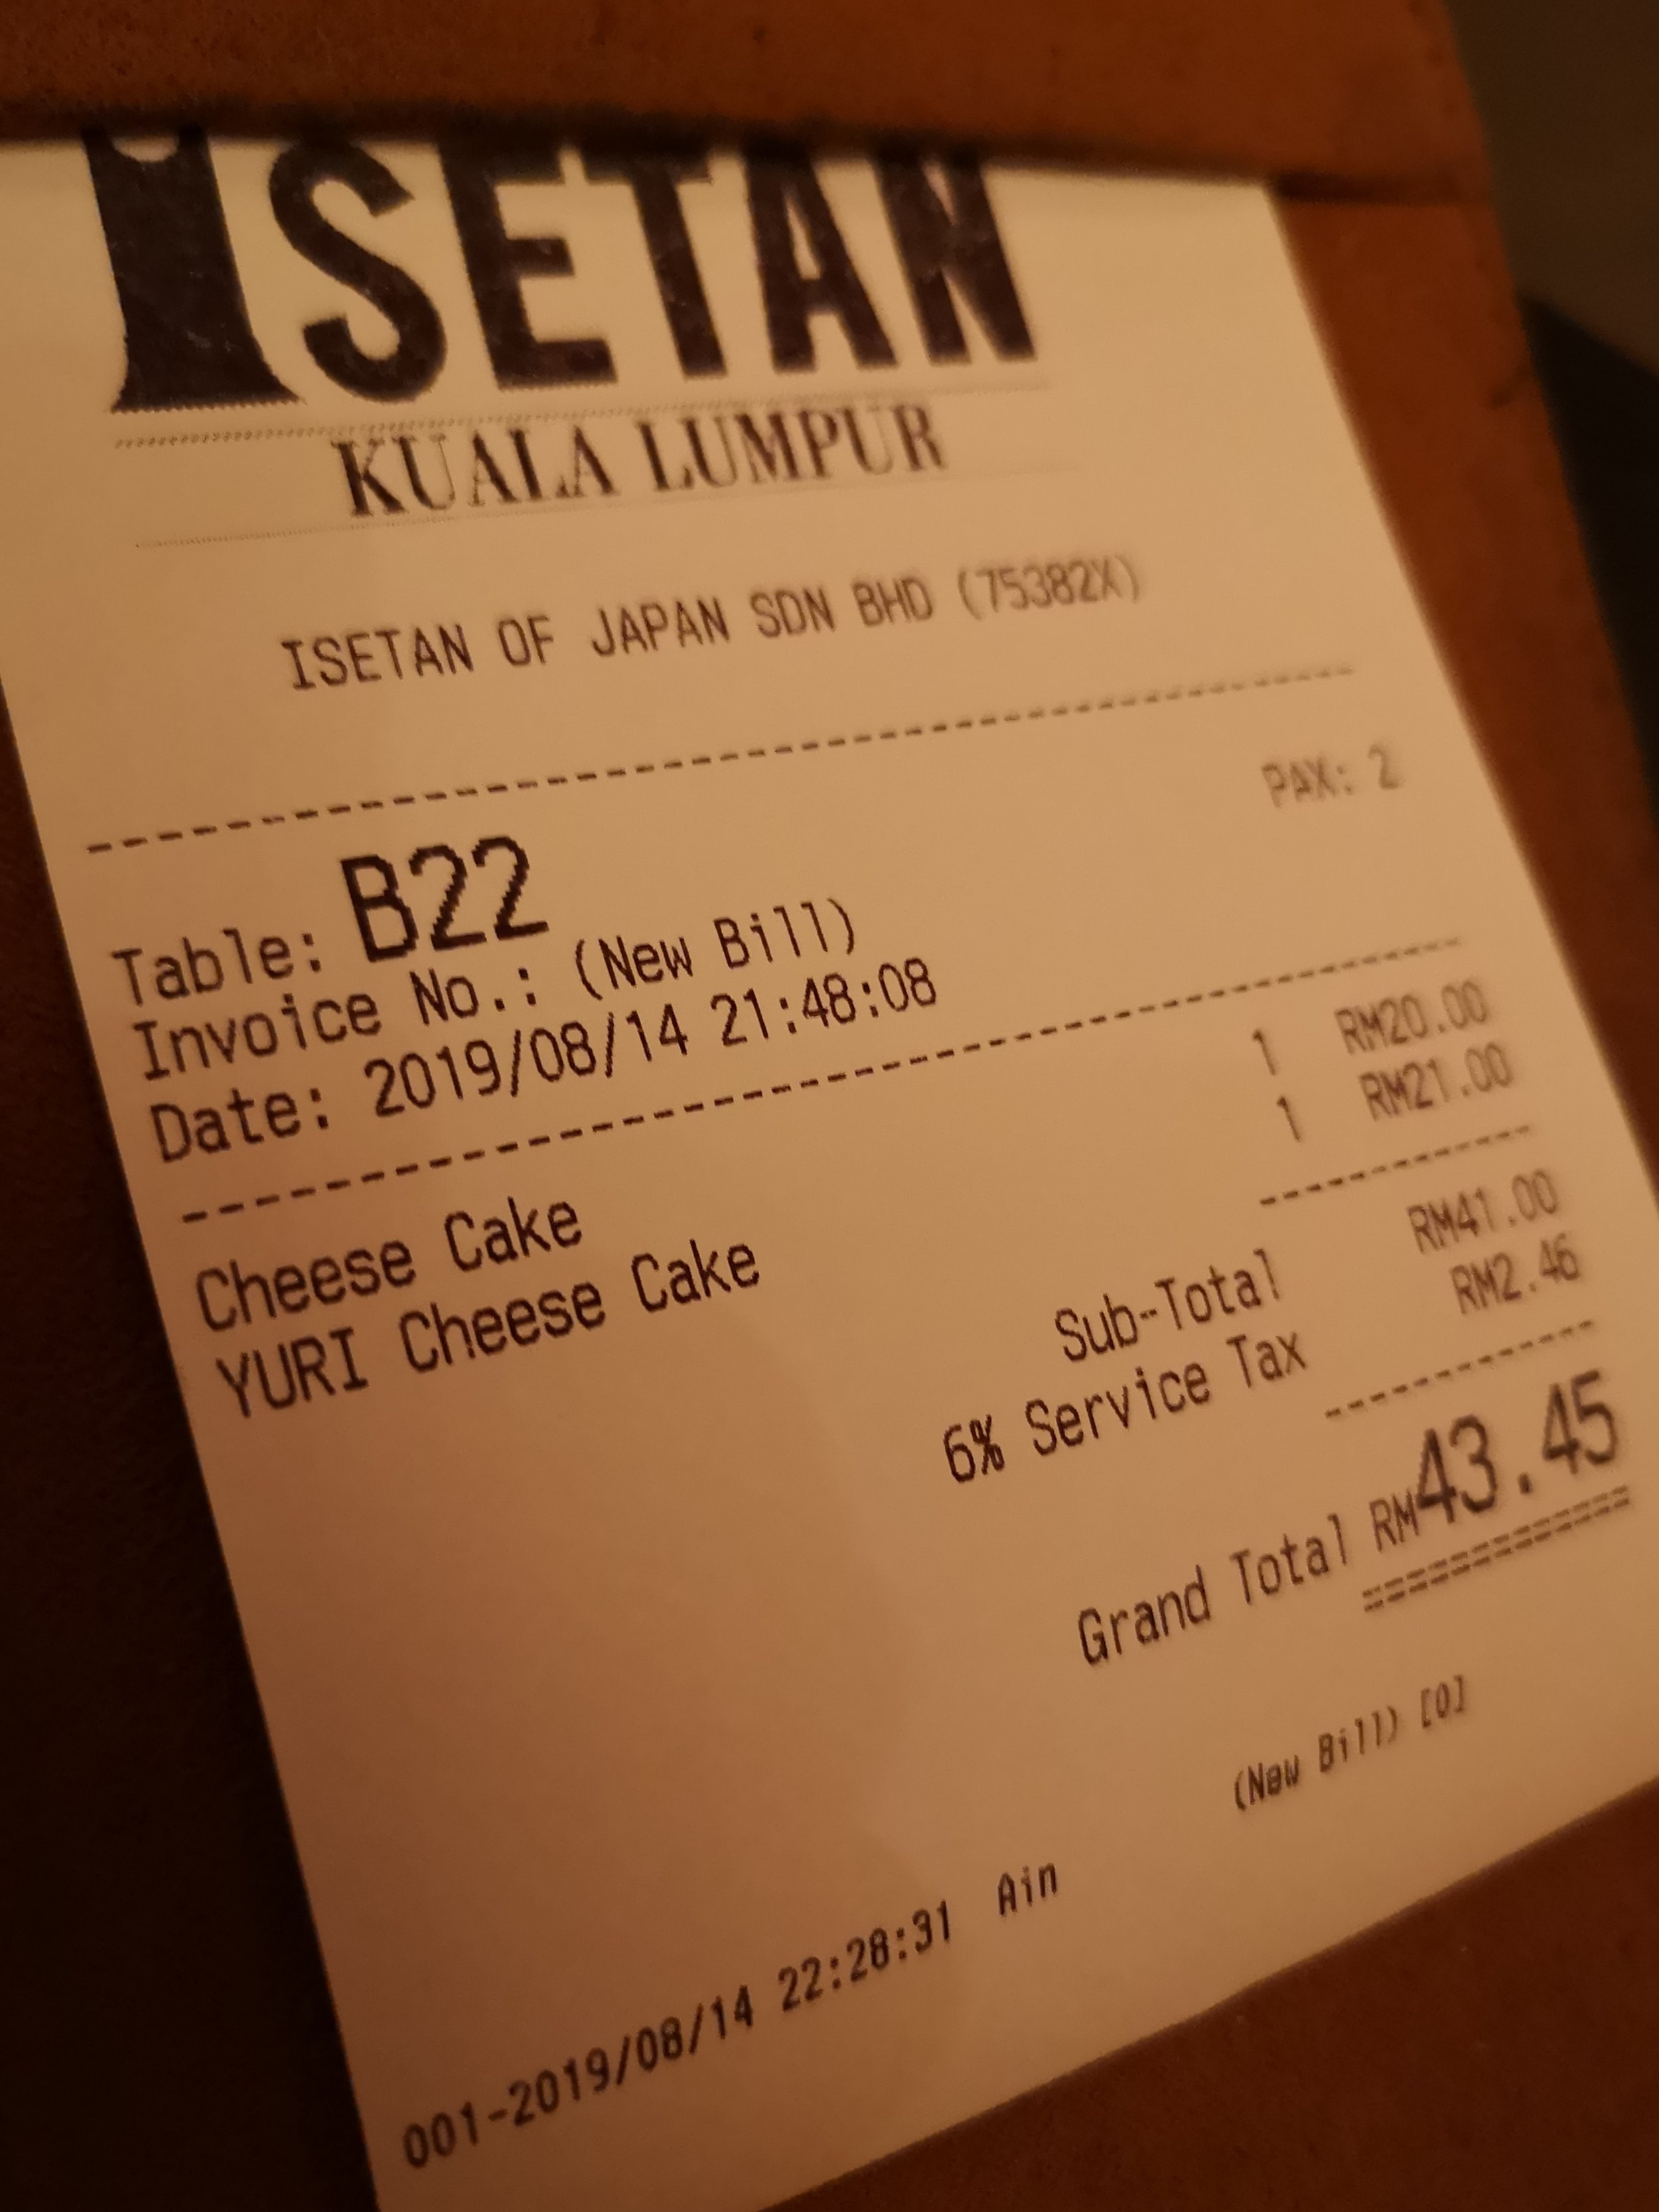 The Tokyo Restaurant Lot 10 Price